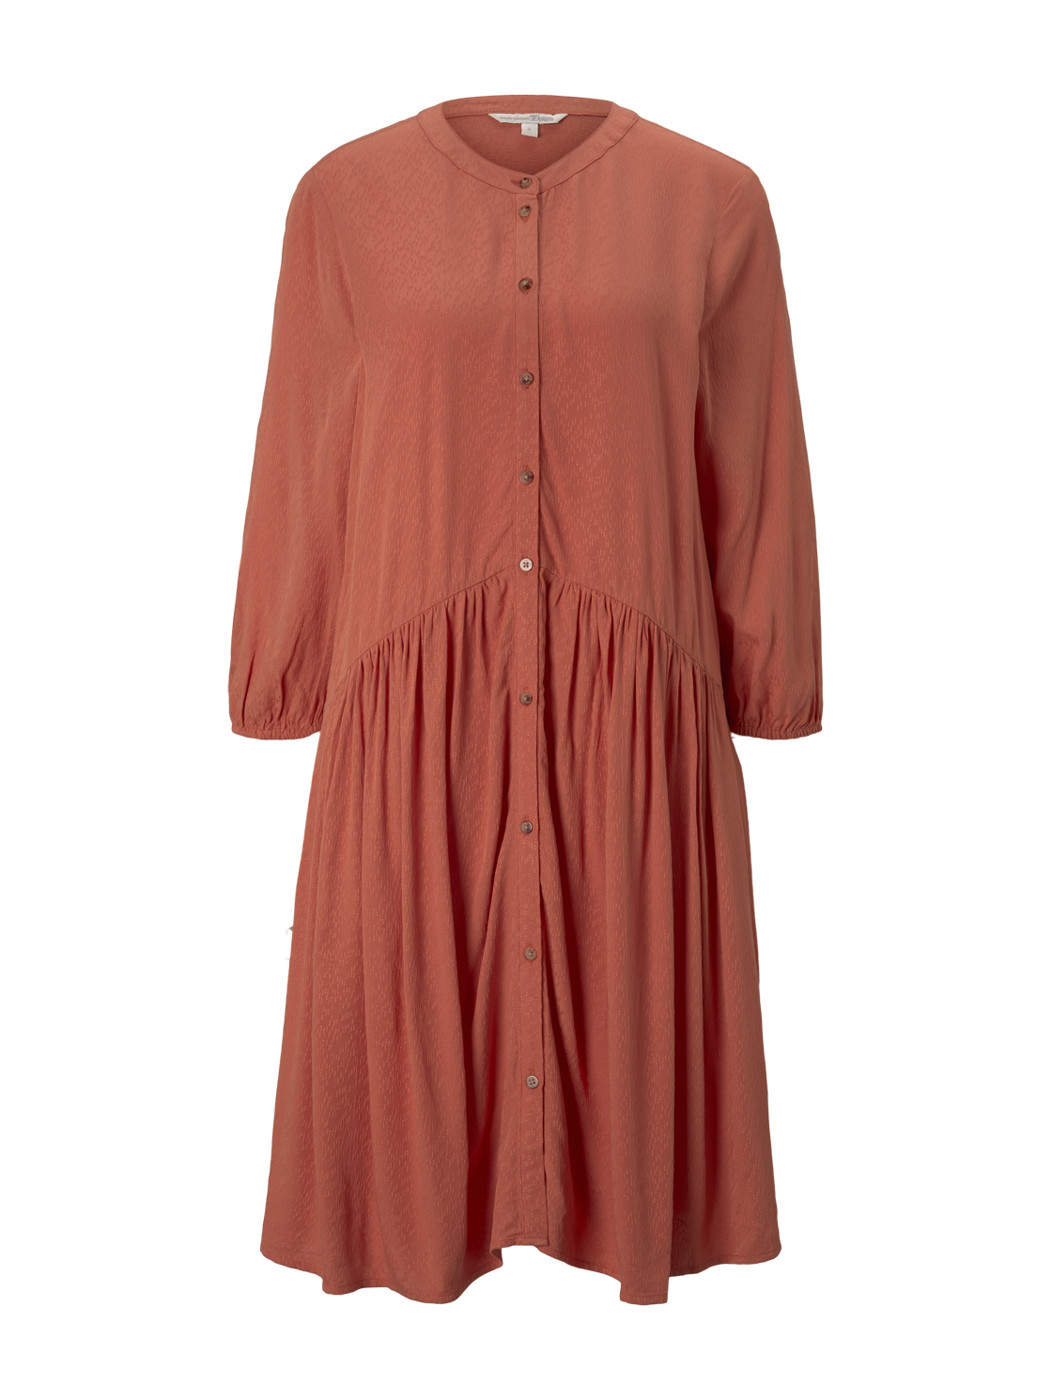 dress with button down placket - Damen